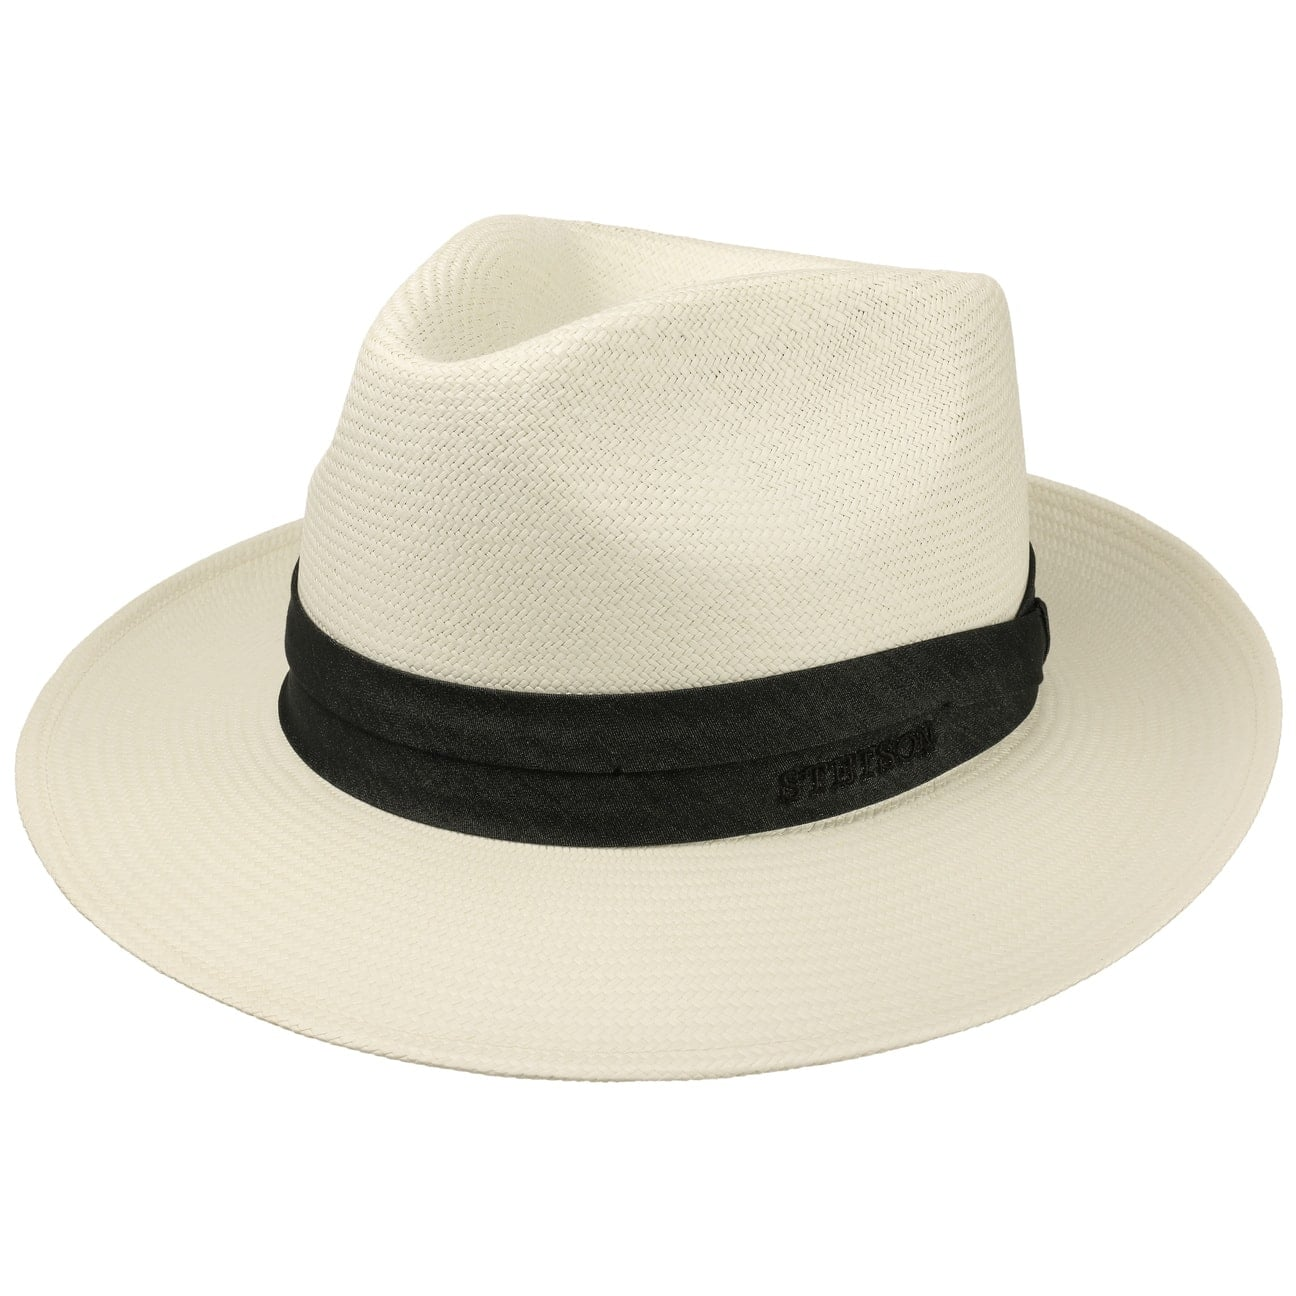 Jenkins Bleached Panama Hat by Stetson - cream white 1 e265613fd78